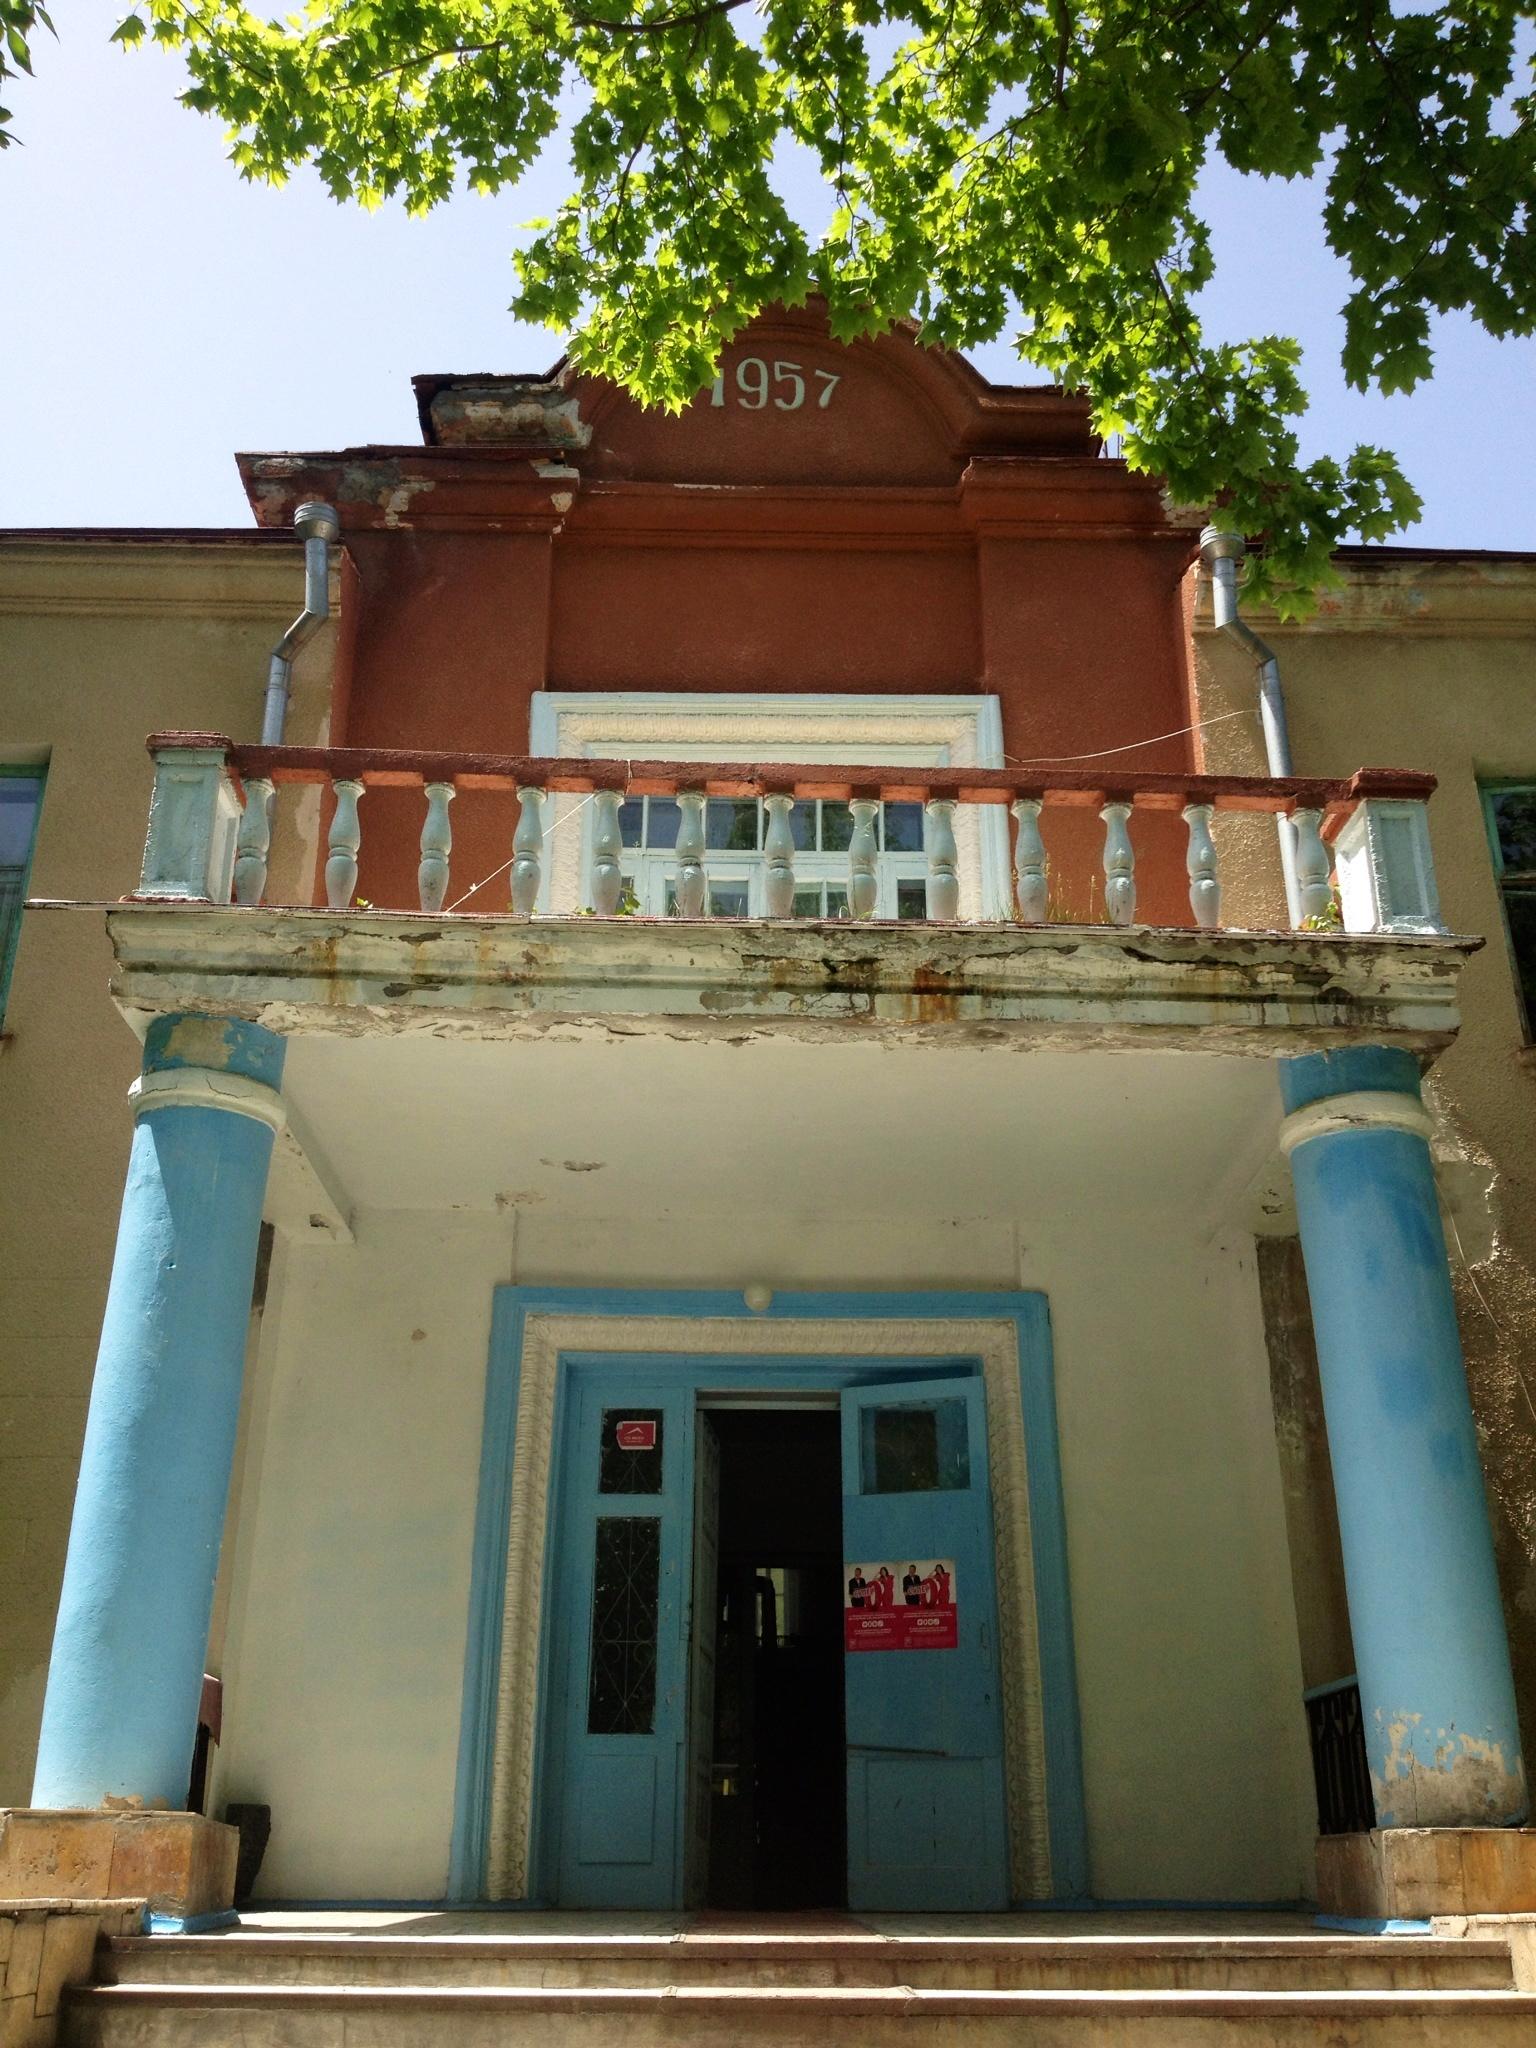 sanitarium in Soviet times